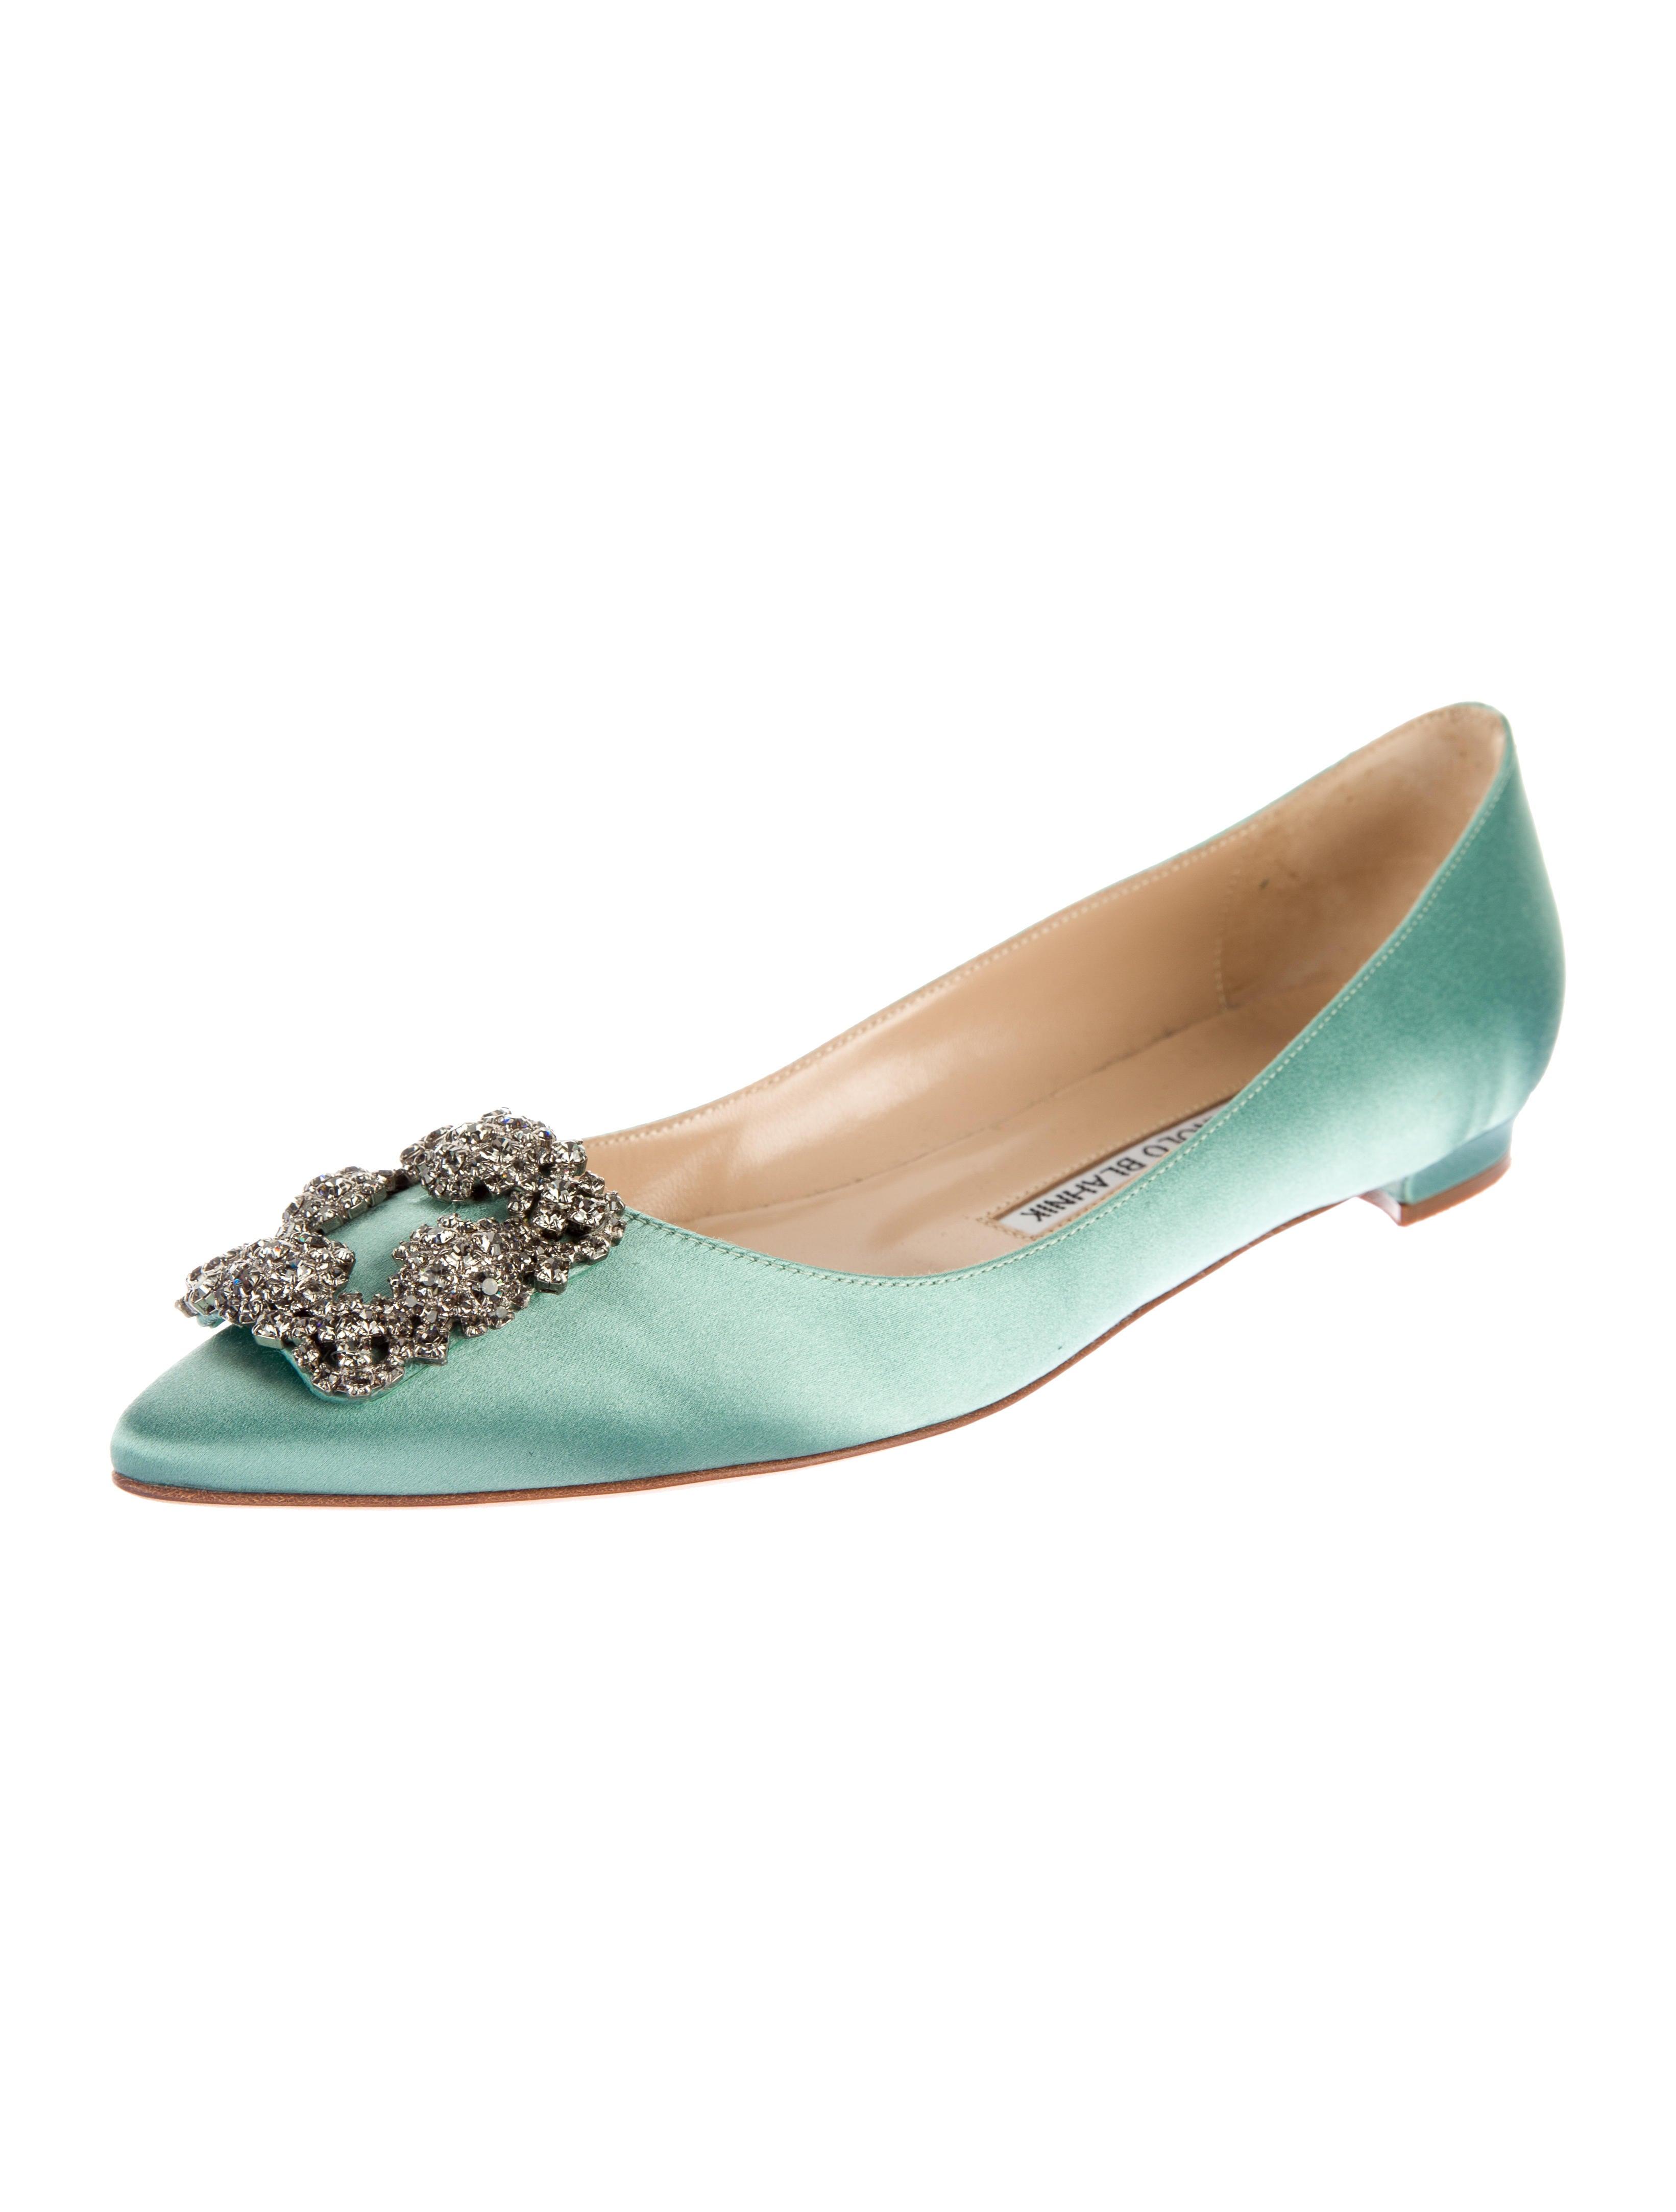 Manolo Blahnik Hangisi Satin Flats Shoes Moo61405